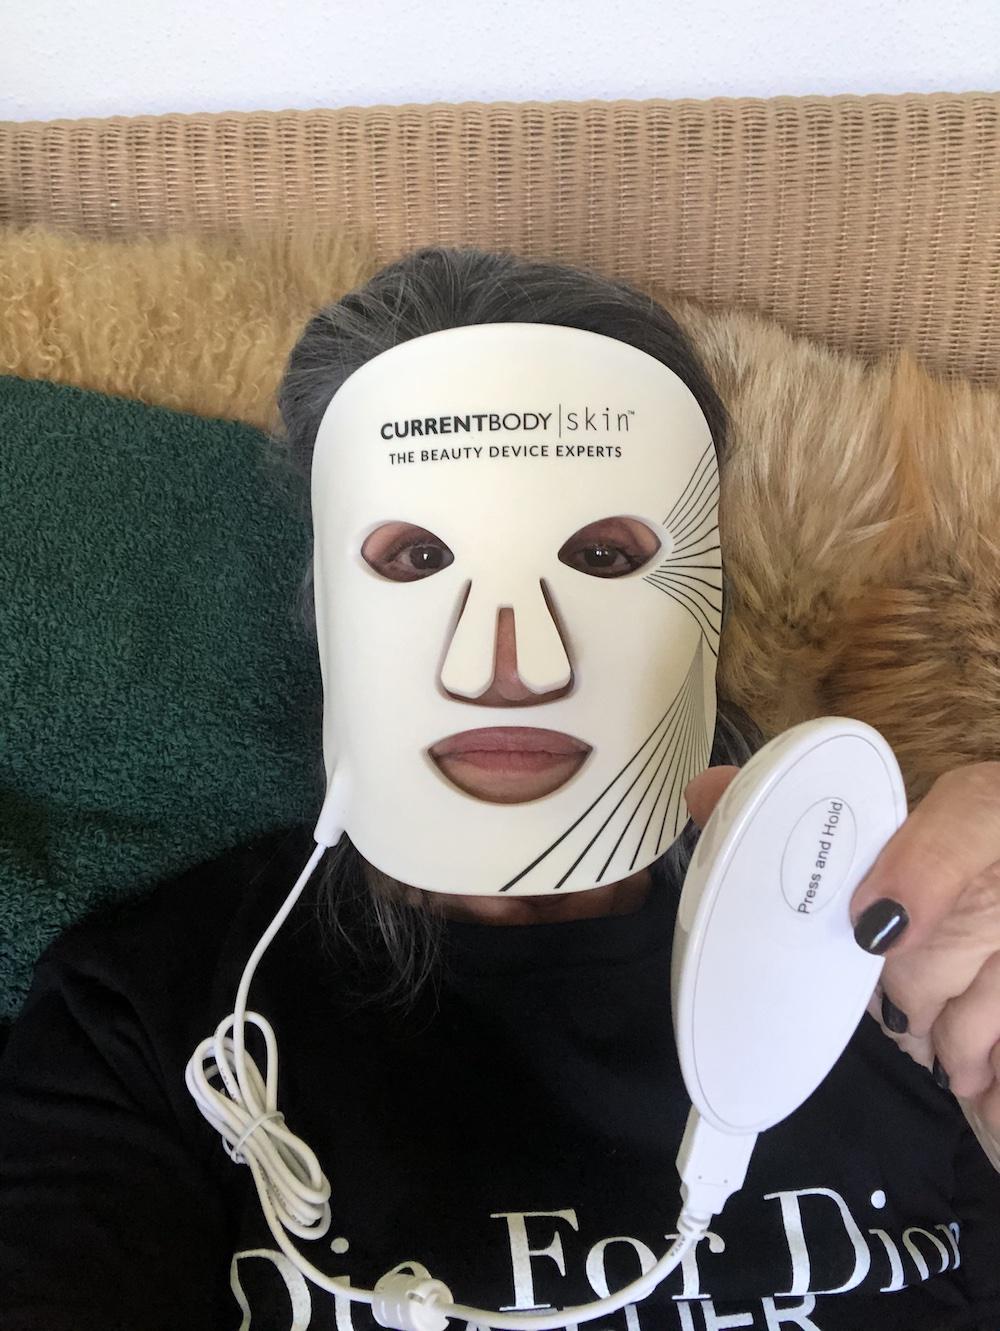 LED-Maske Antig aging Lichttherapie Modepilot